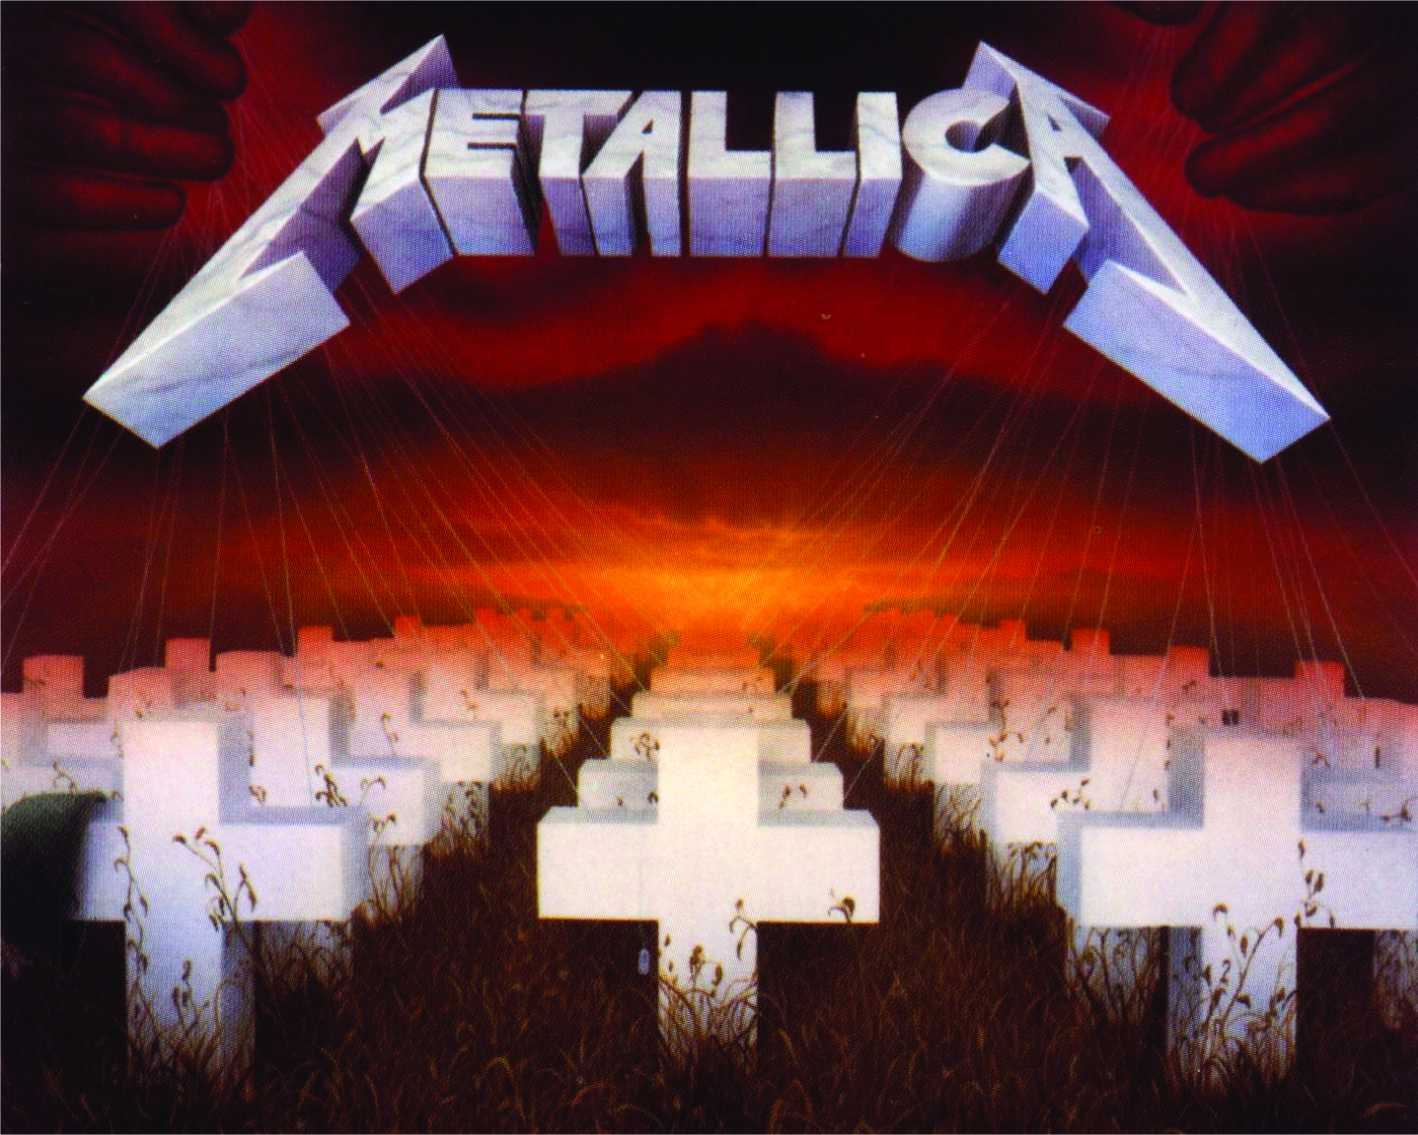 Metallica 1-4-03